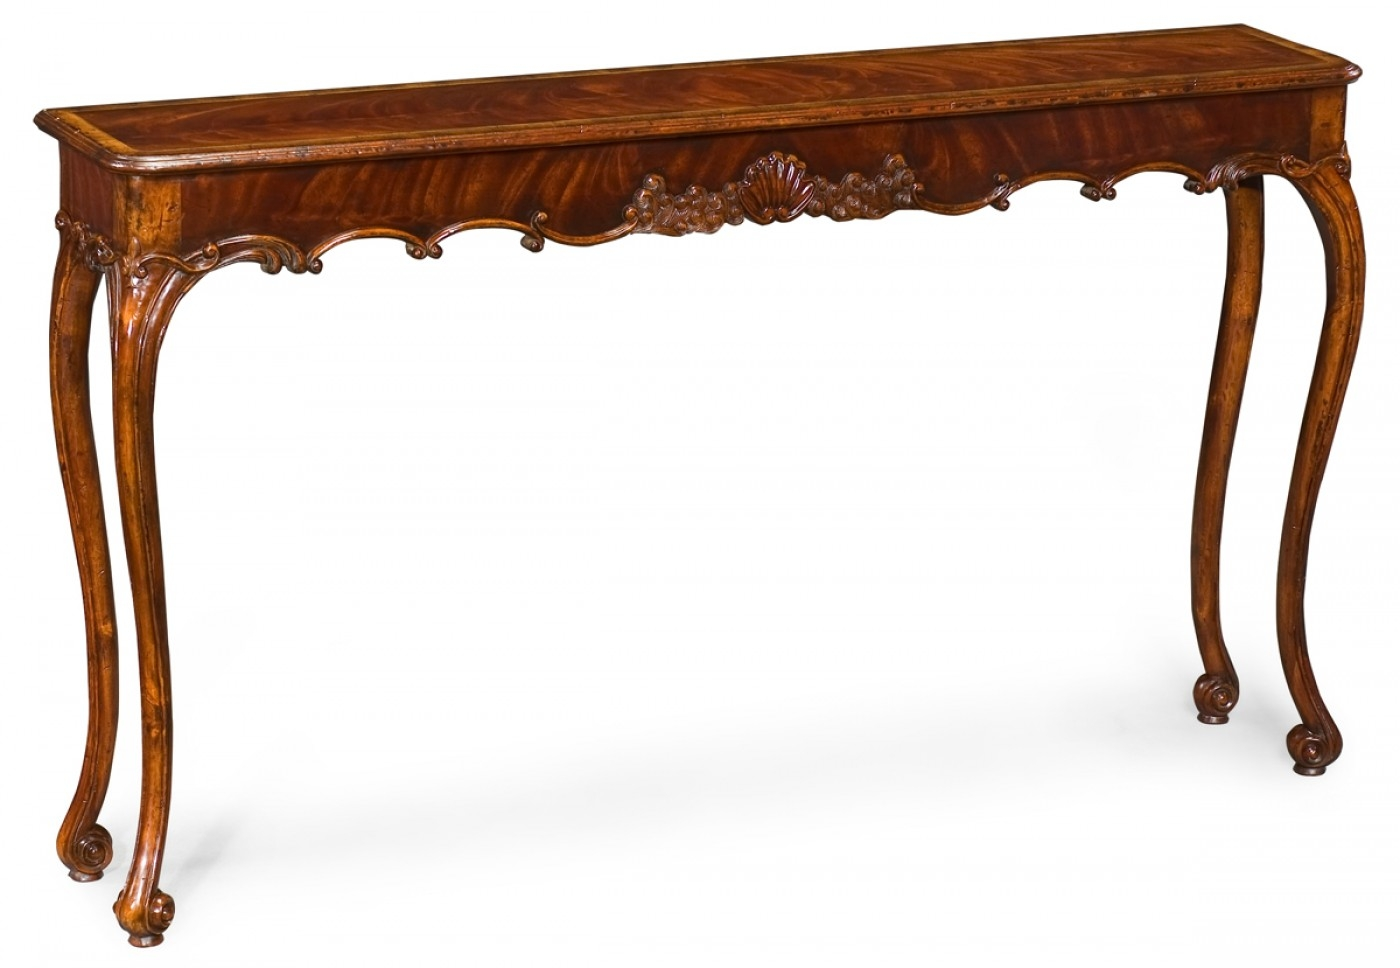 Console & Sofa Tables Mahogany Console, Sofa Table